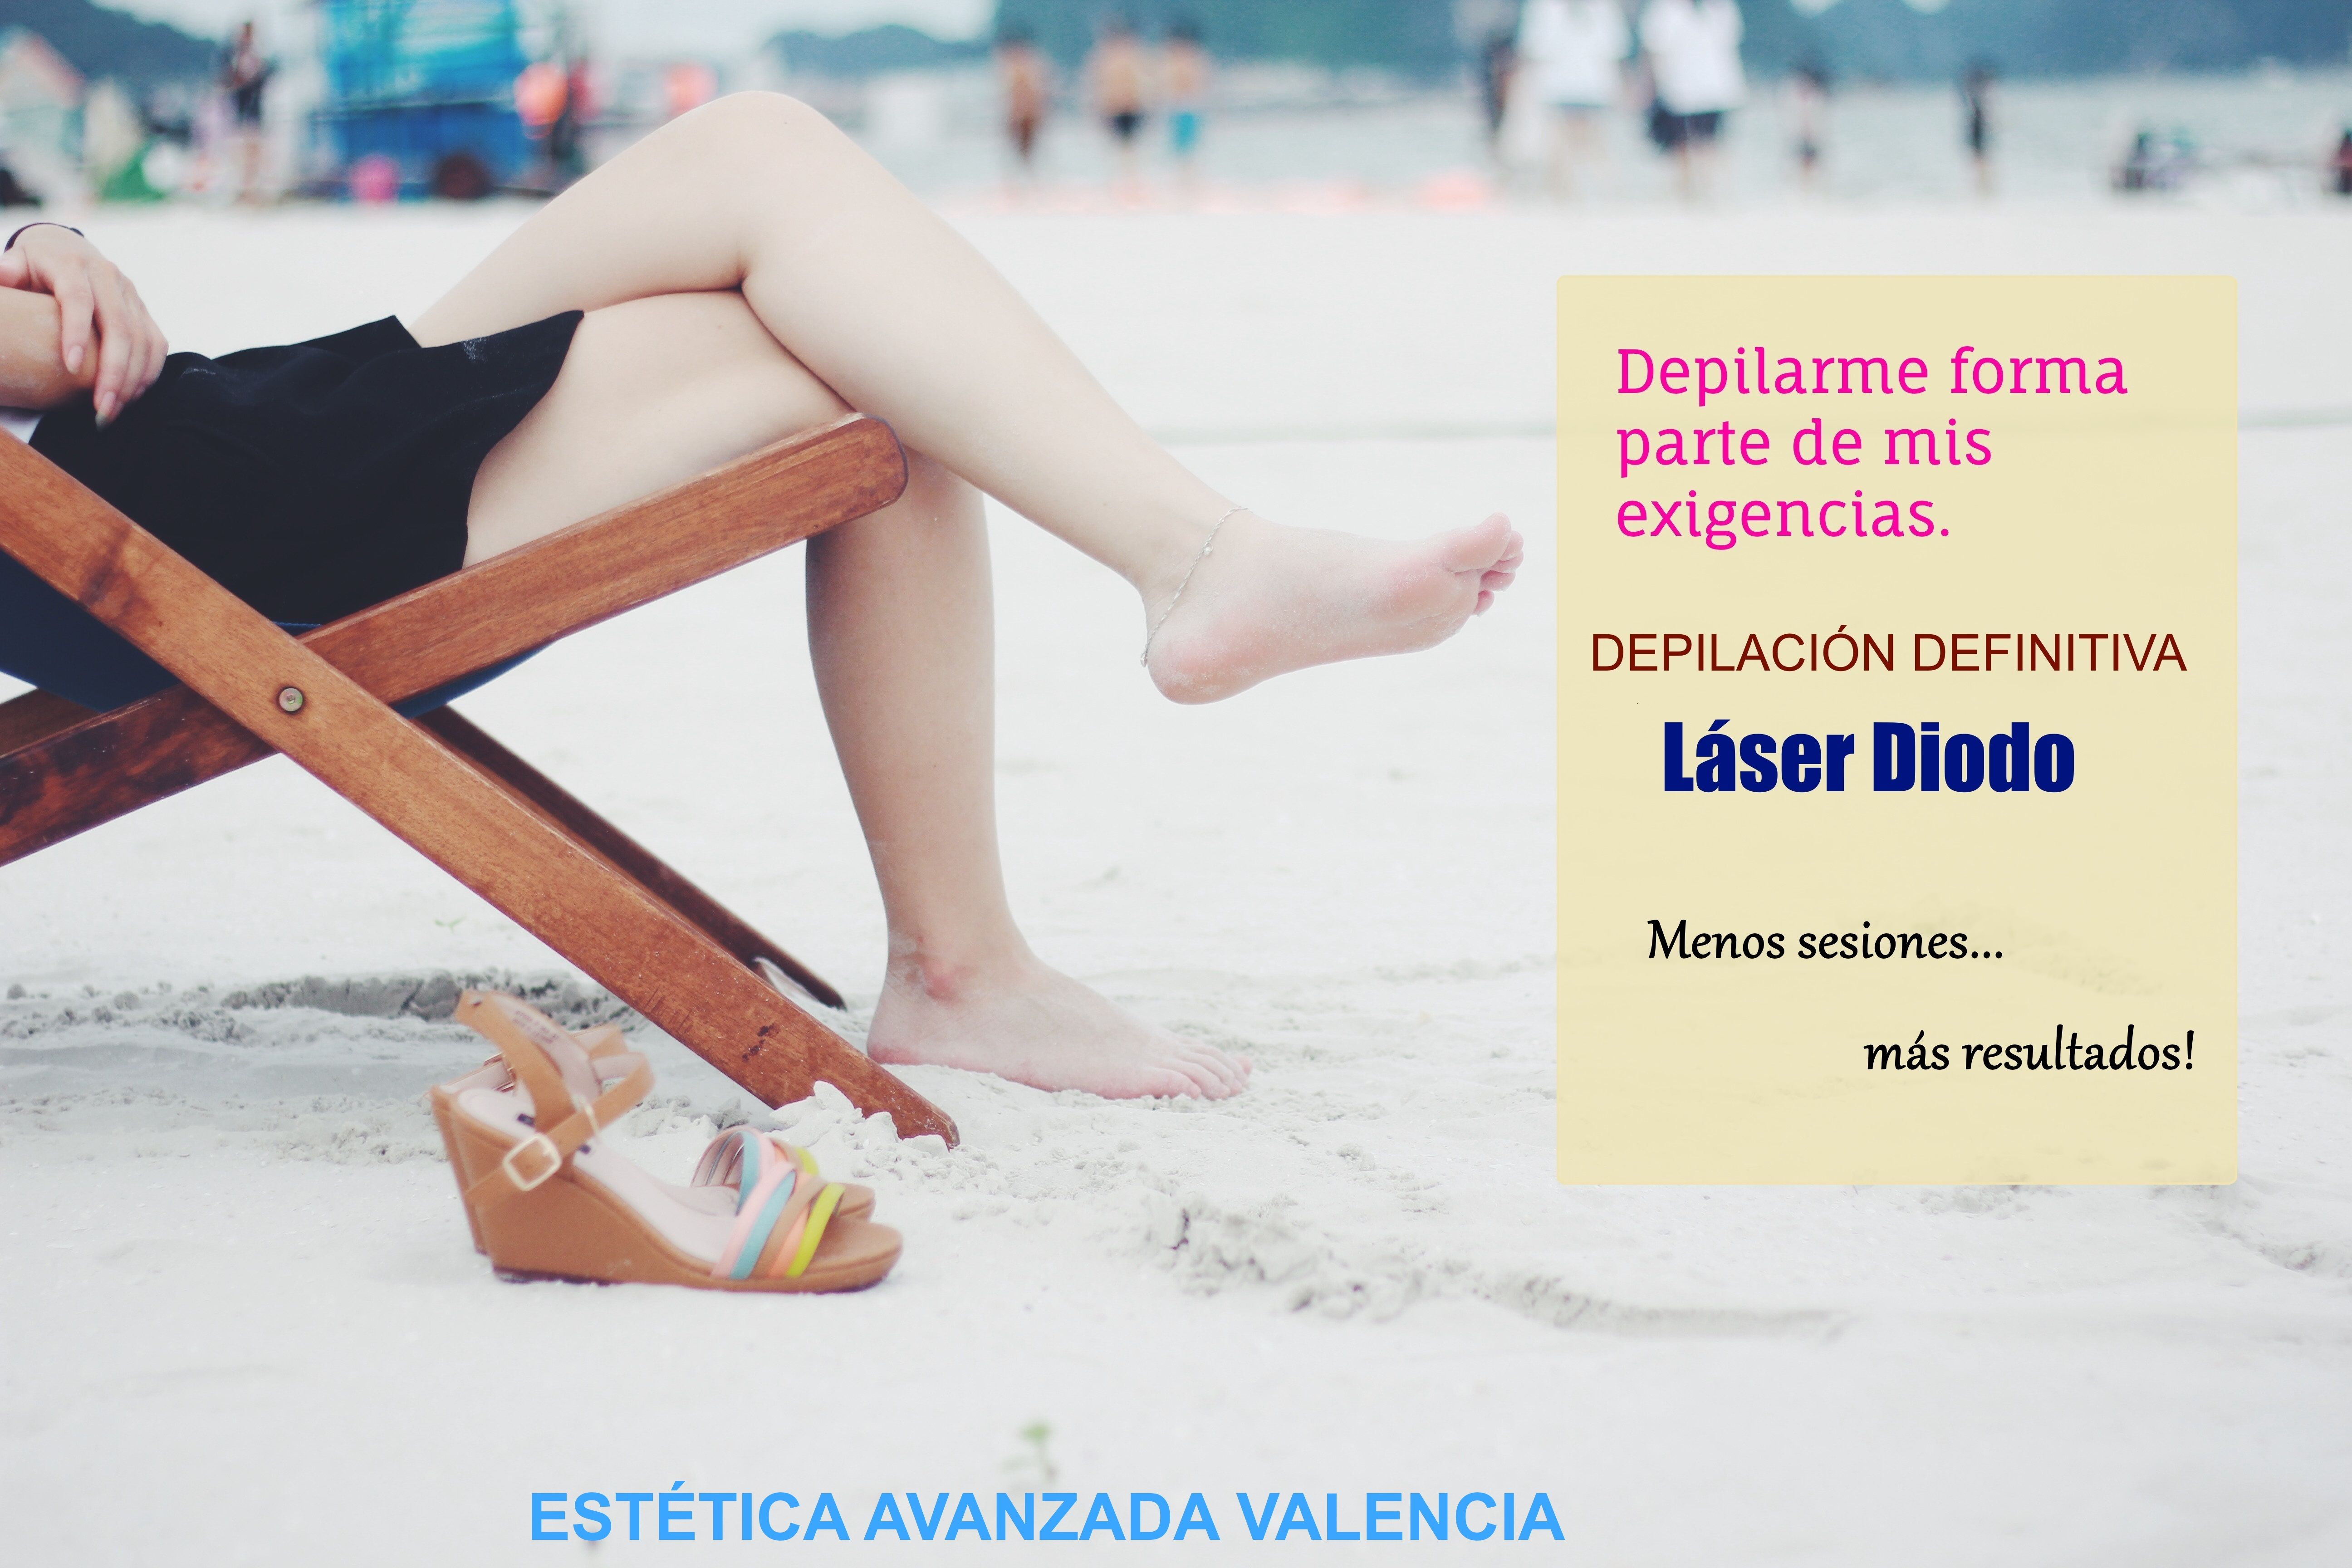 Pin De Est Tica Avanzada Valencia En Est Tica Avanzada Valencia  # Wizar Muebles Para Estetica